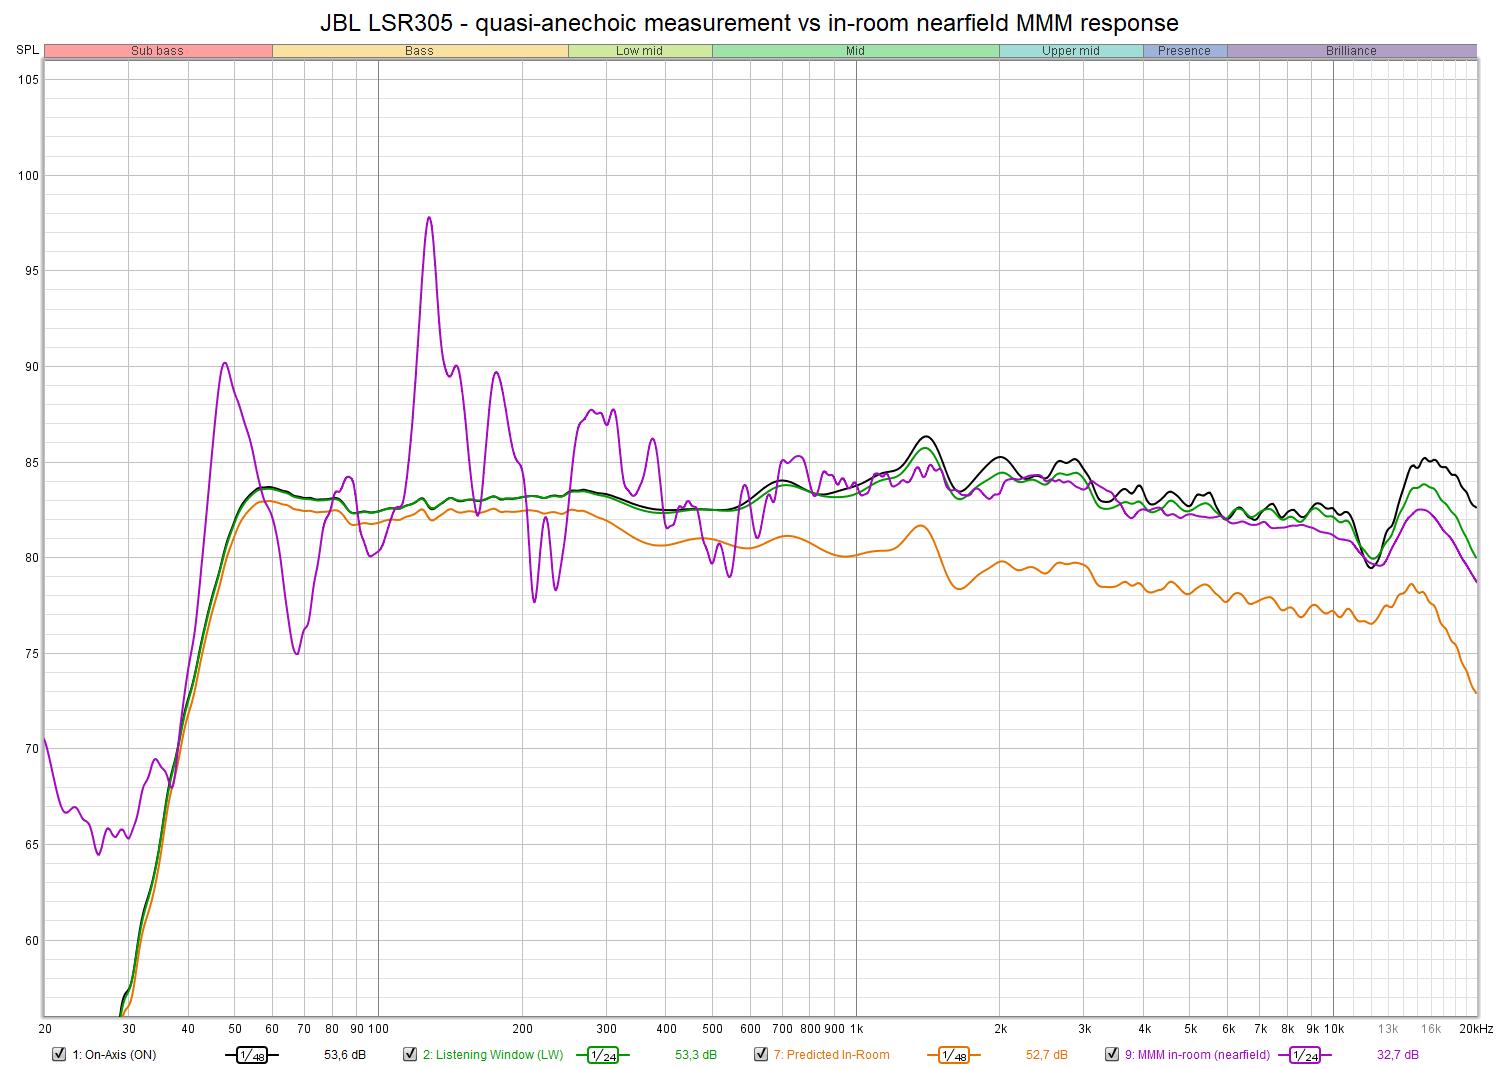 JBL LSR305 - quasi-anechoic measurement vs in-room nearfield MMM response.png